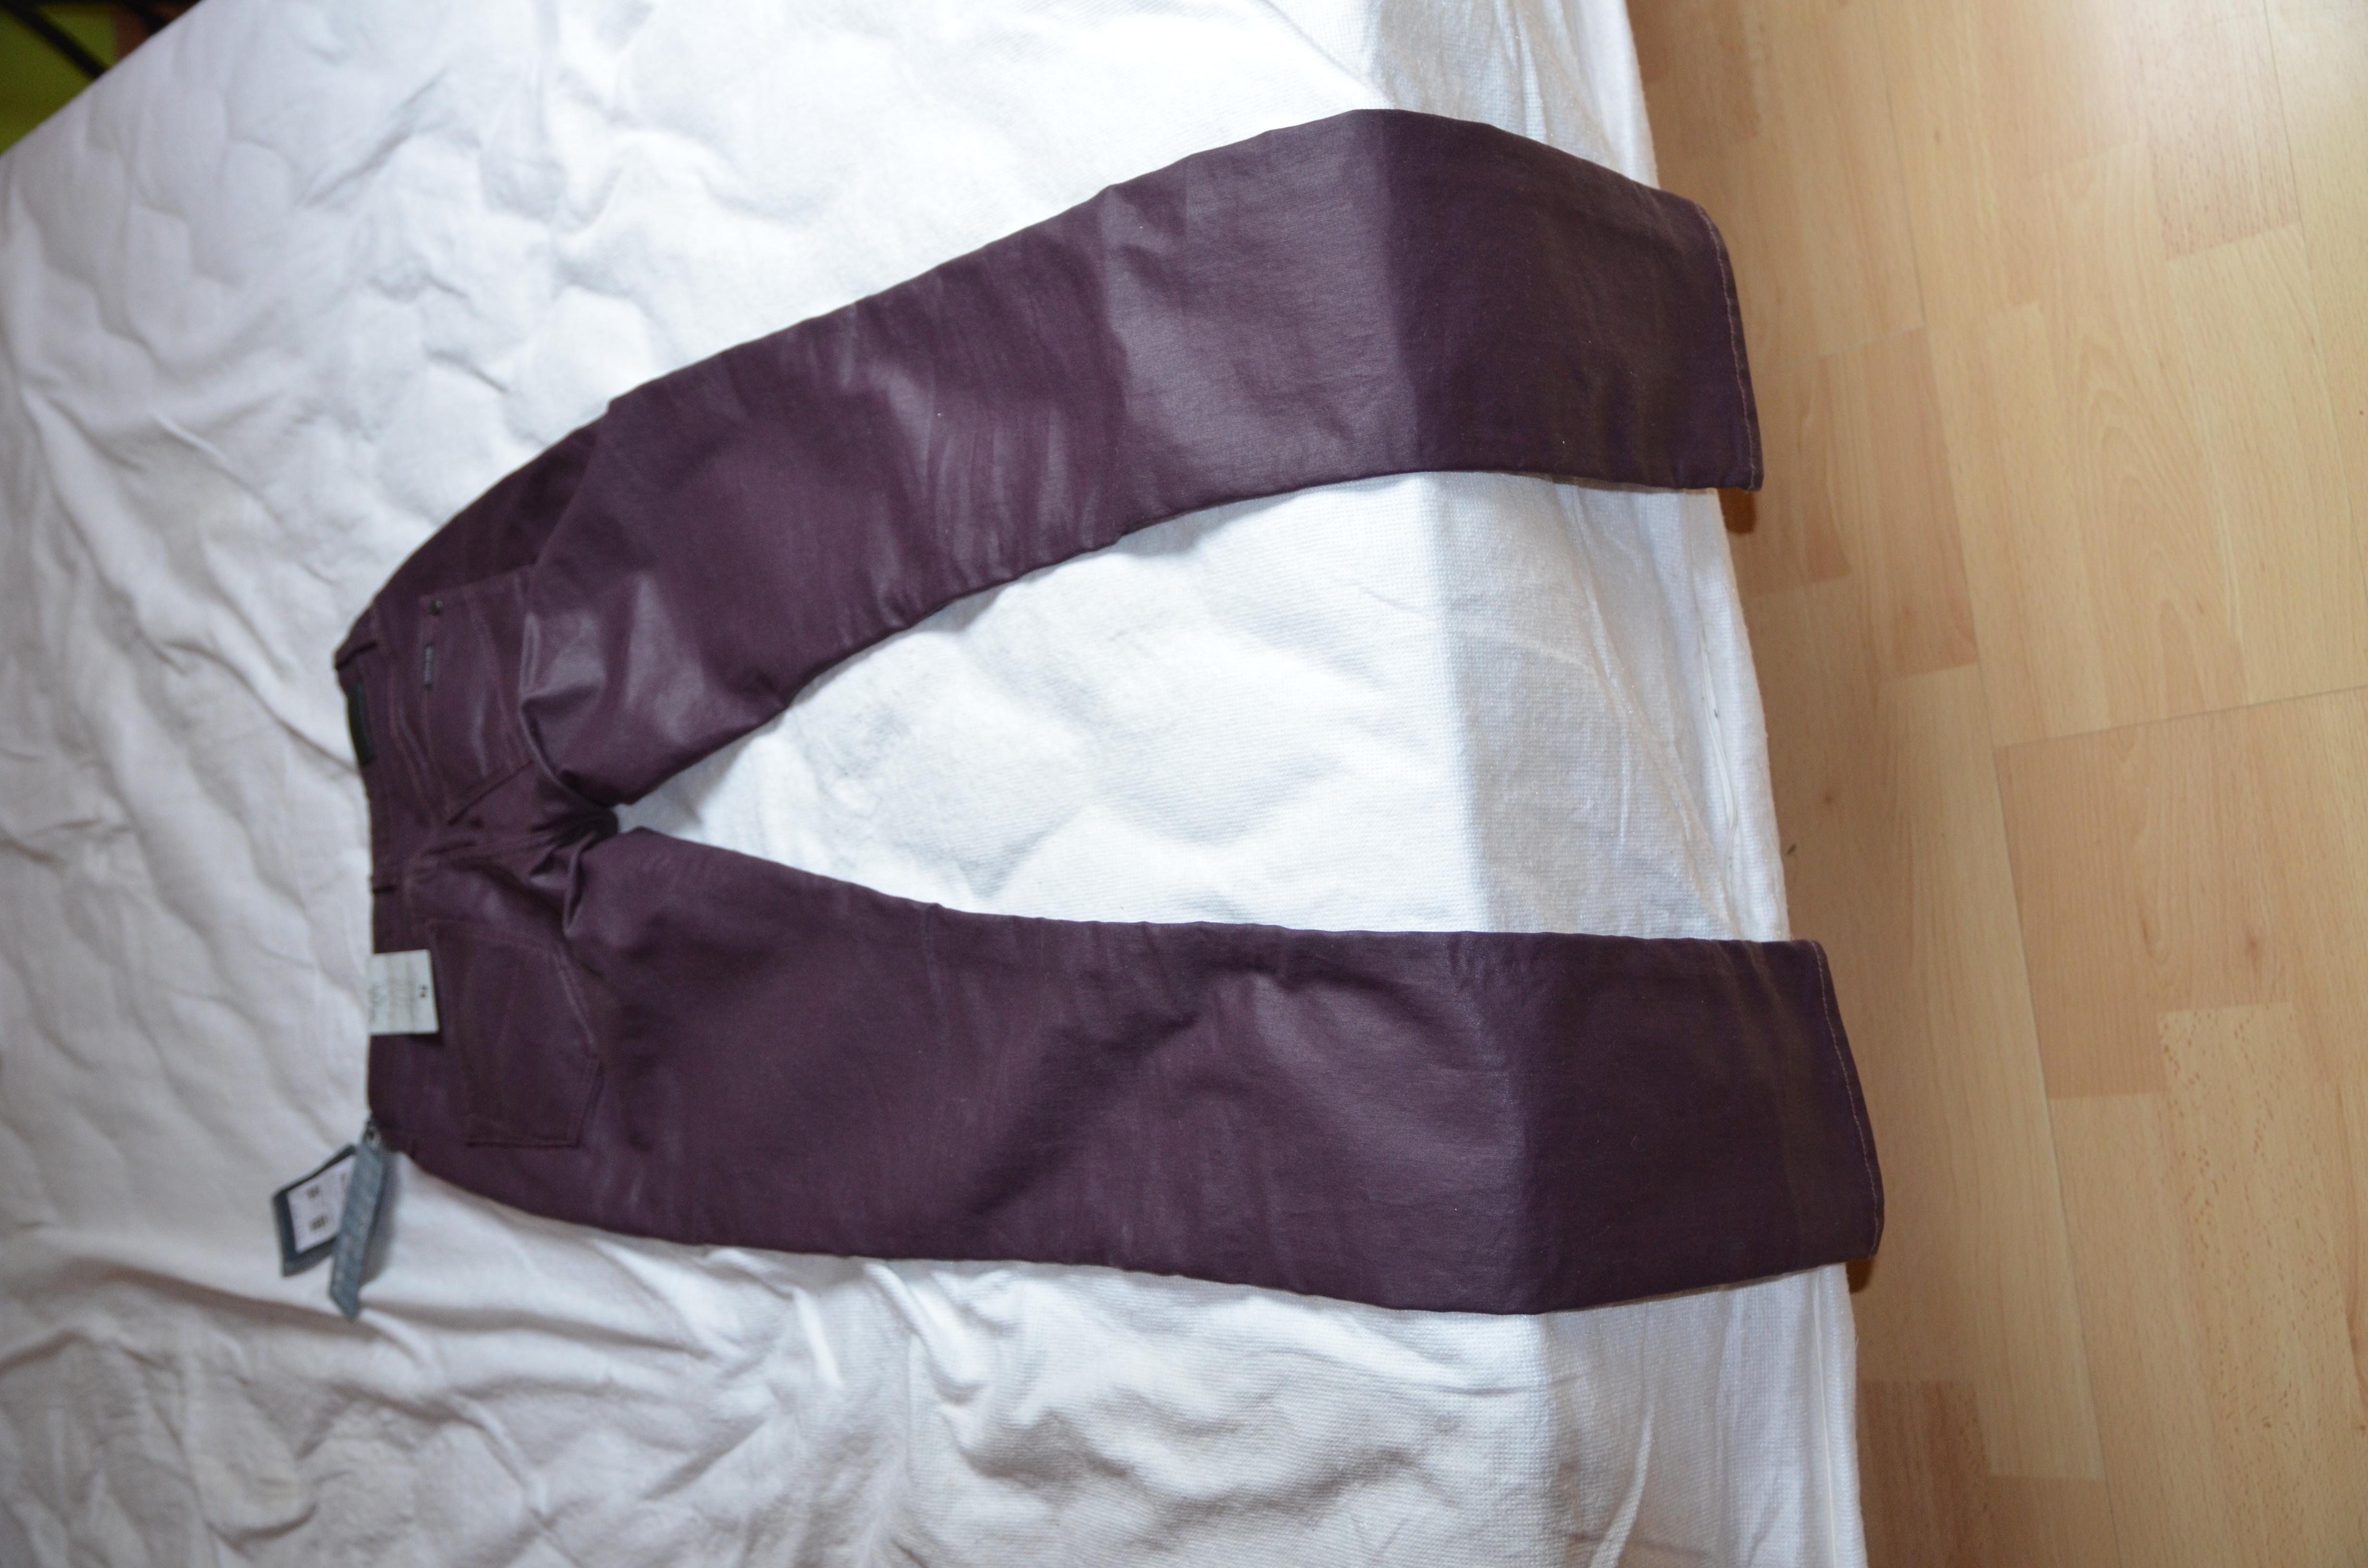 pantalon slim leg taille 34 /36 pourpre 45 Flers-en-Escrebieux (59)